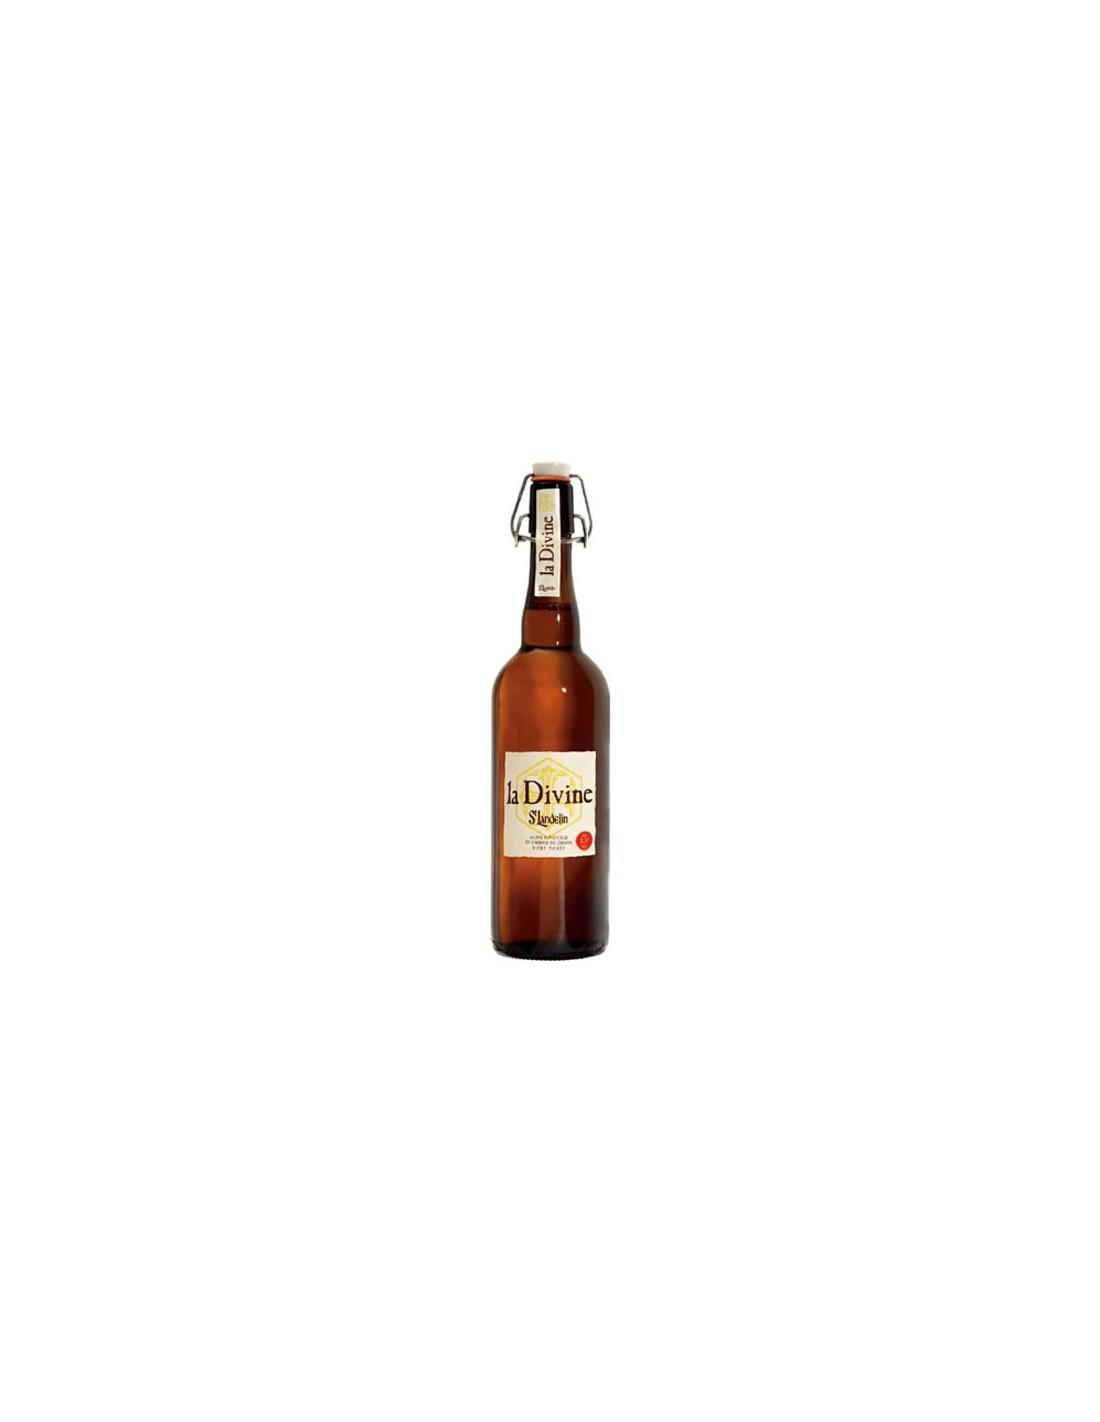 Bere amber La Divine St. Landelin, 8.5% alc., 0.33L, Belgia